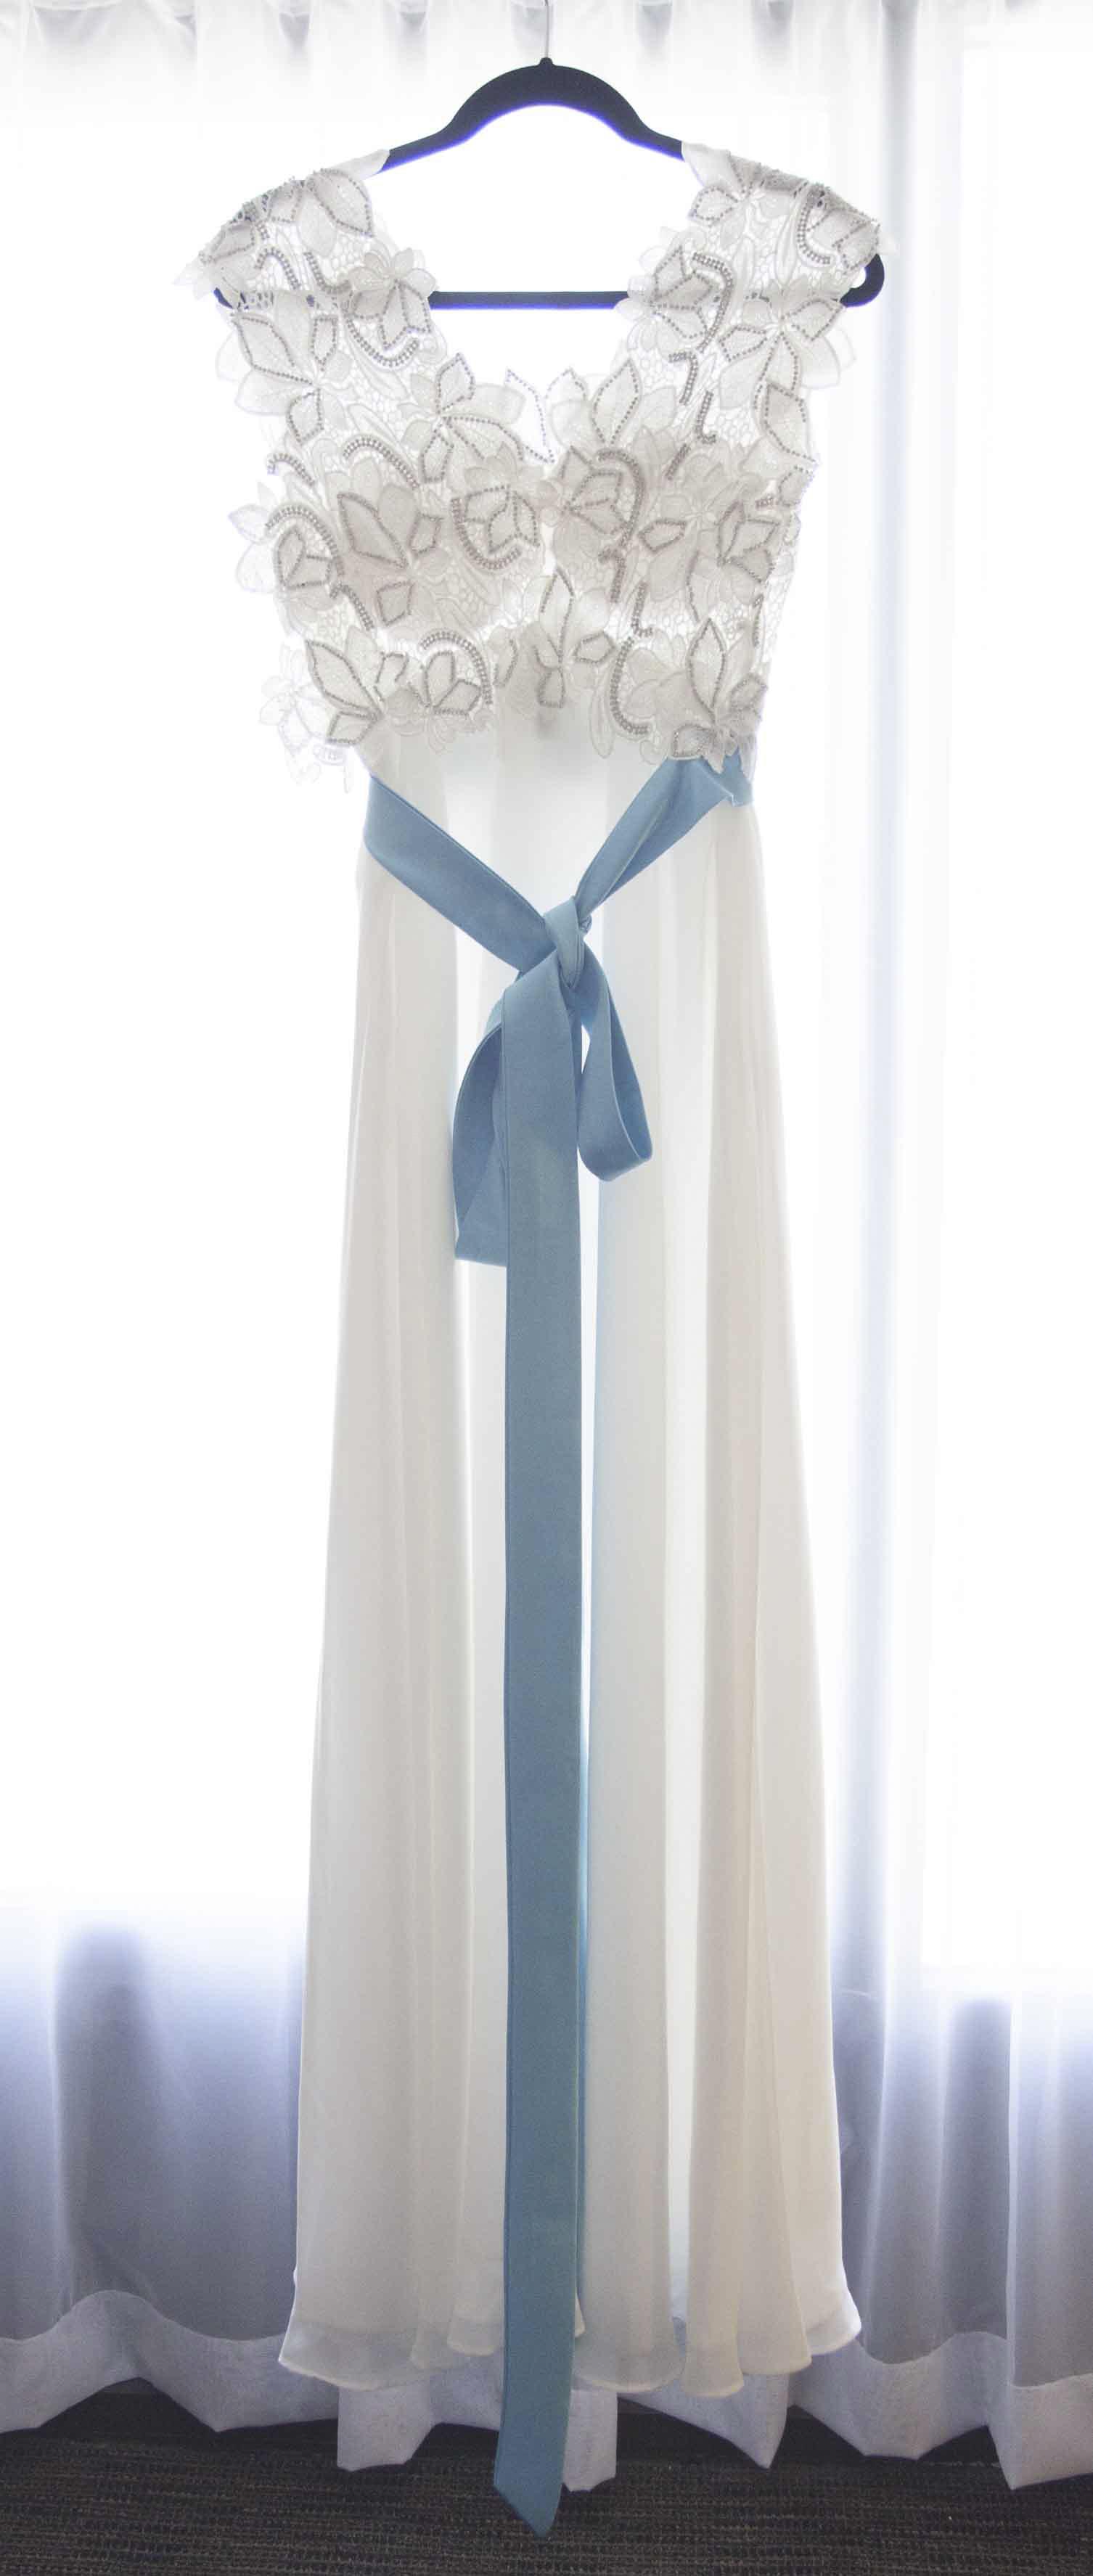 Beiersdorfer Wedding 1 - 31.jpg